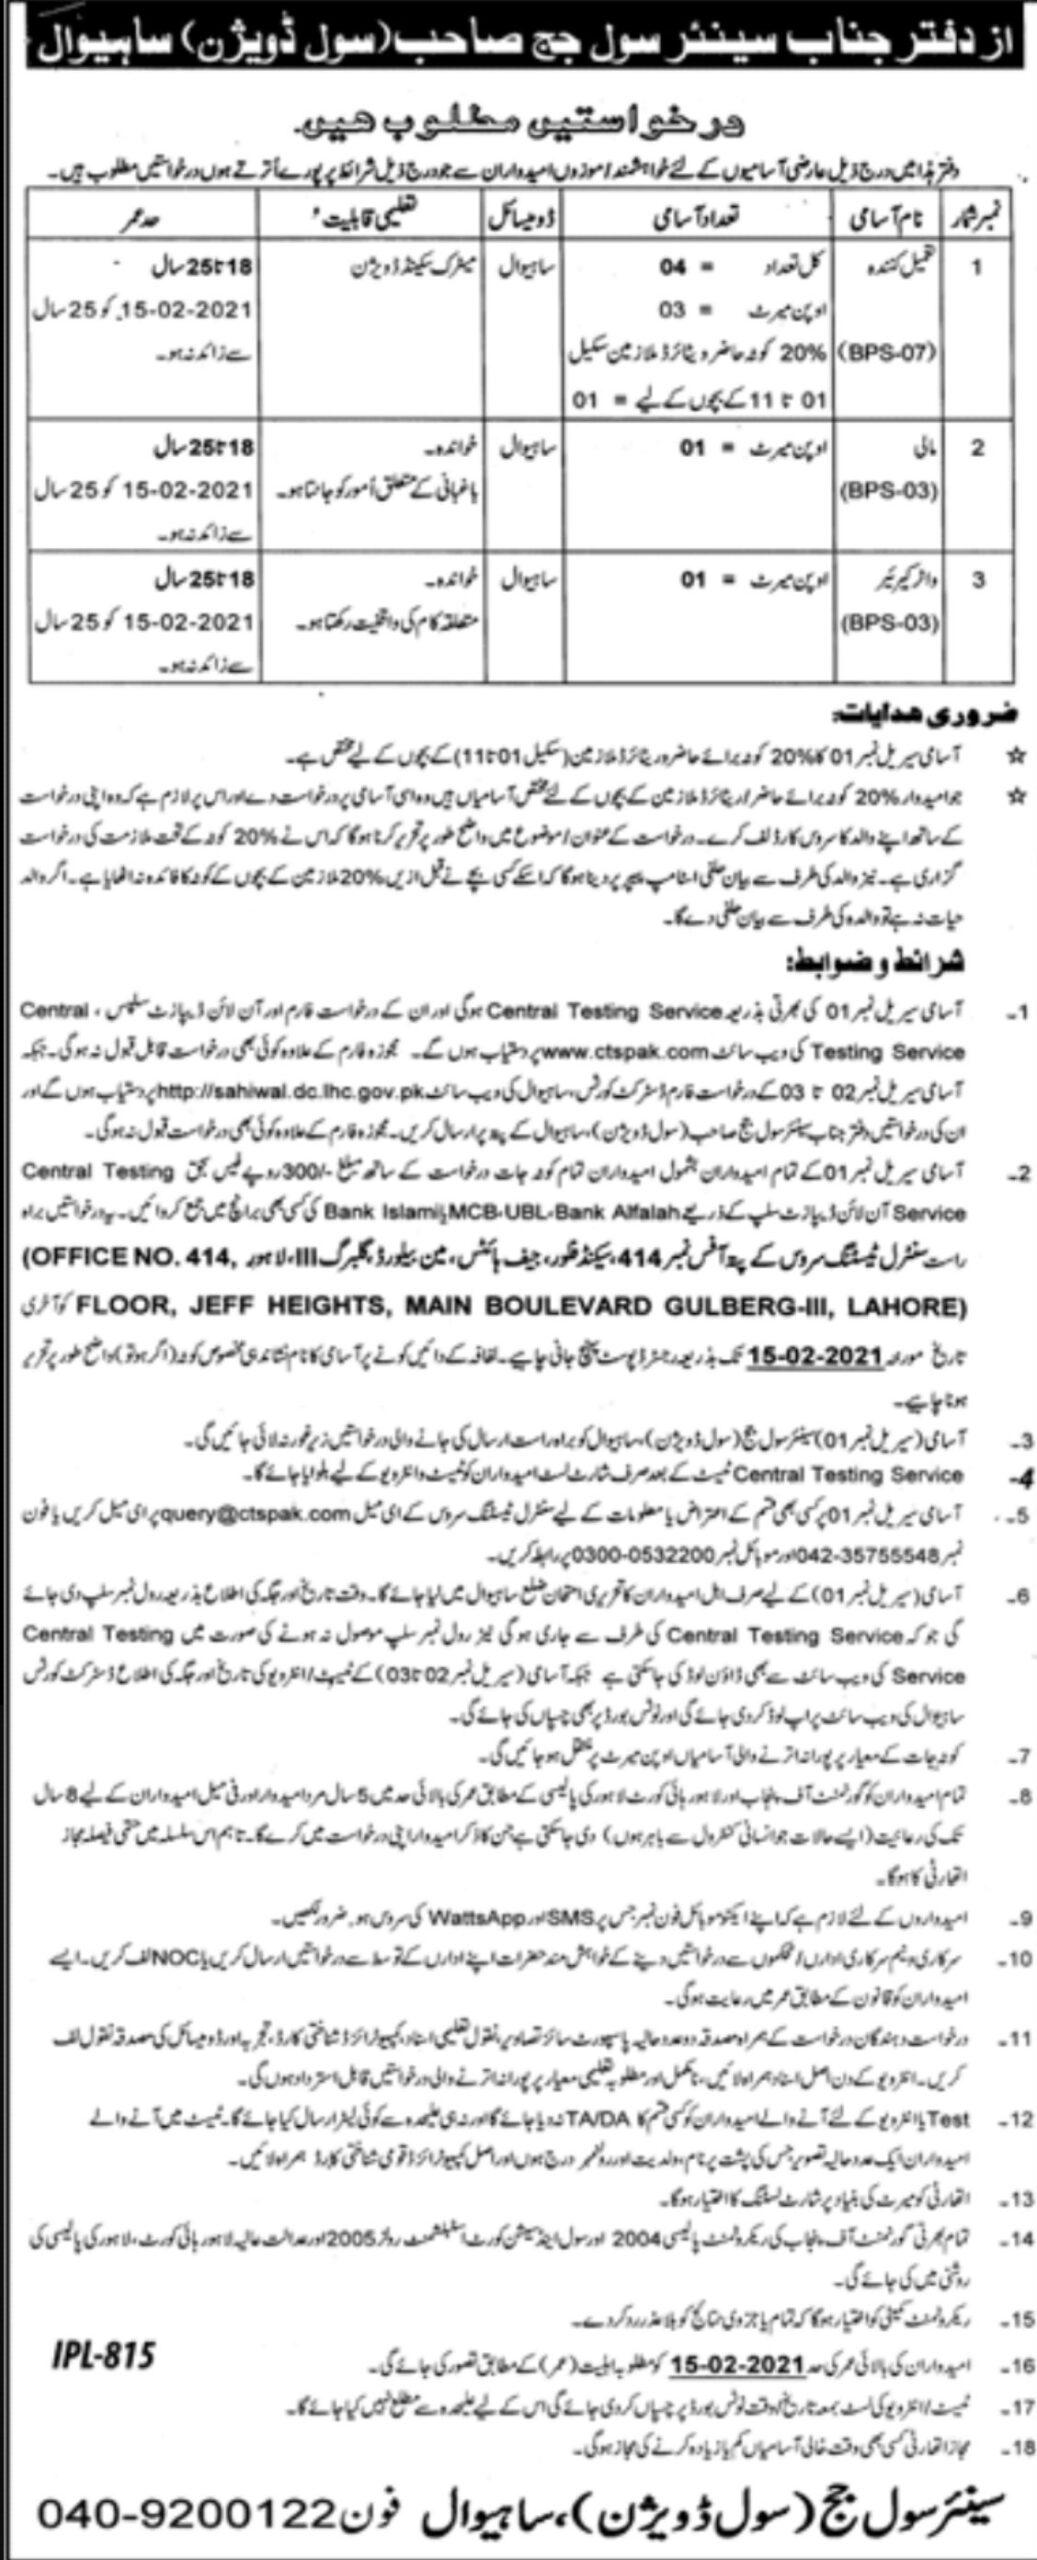 Government of Punjab Senior Civil Judge Sahiwal Jobs 2021